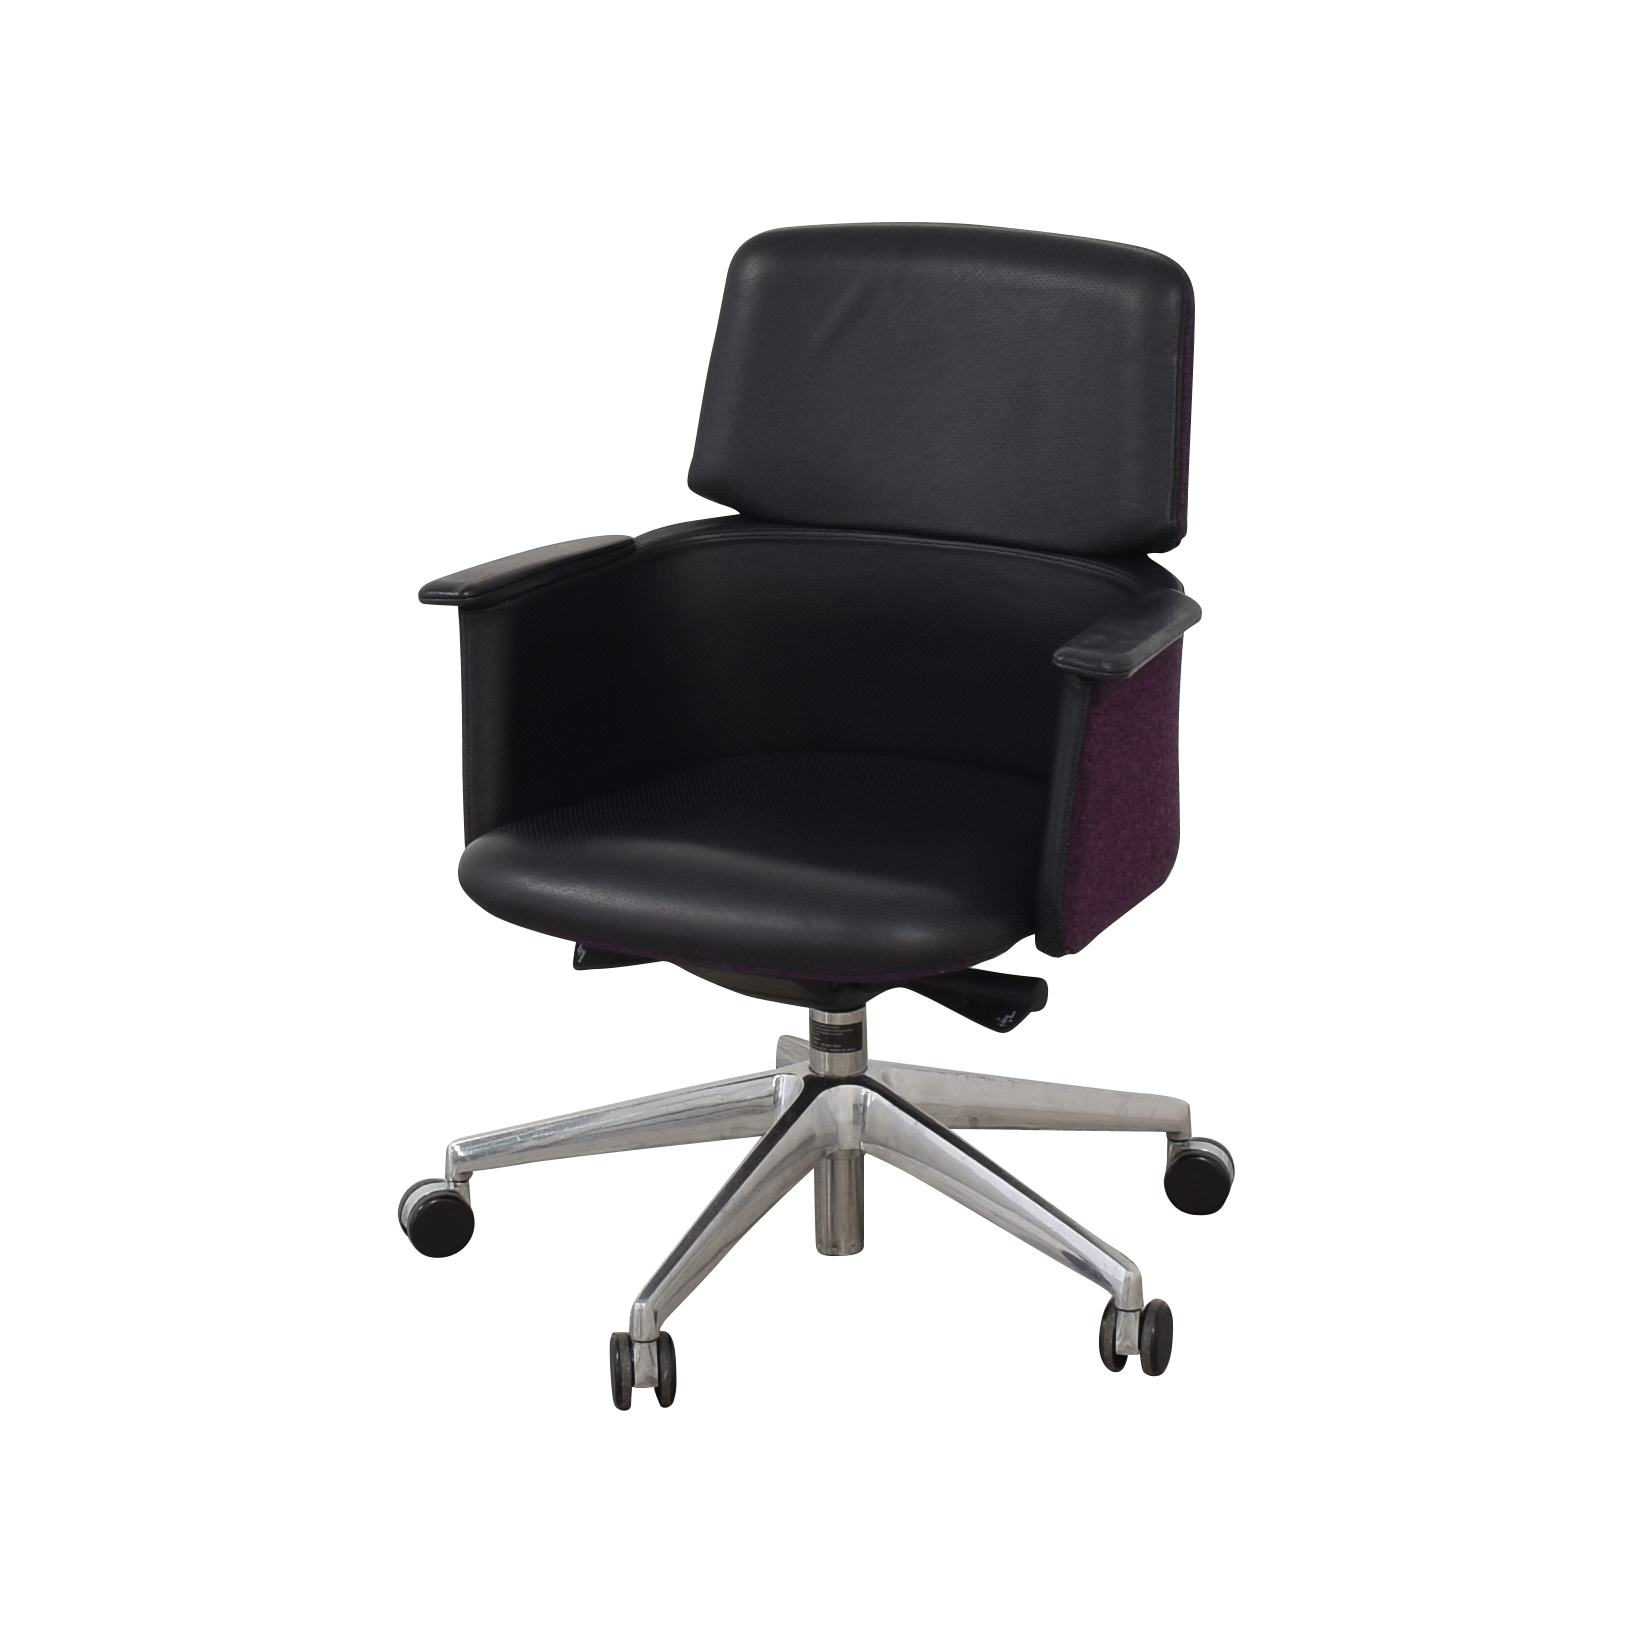 Koleksiyon Koleksiyon Tola Task Chair price